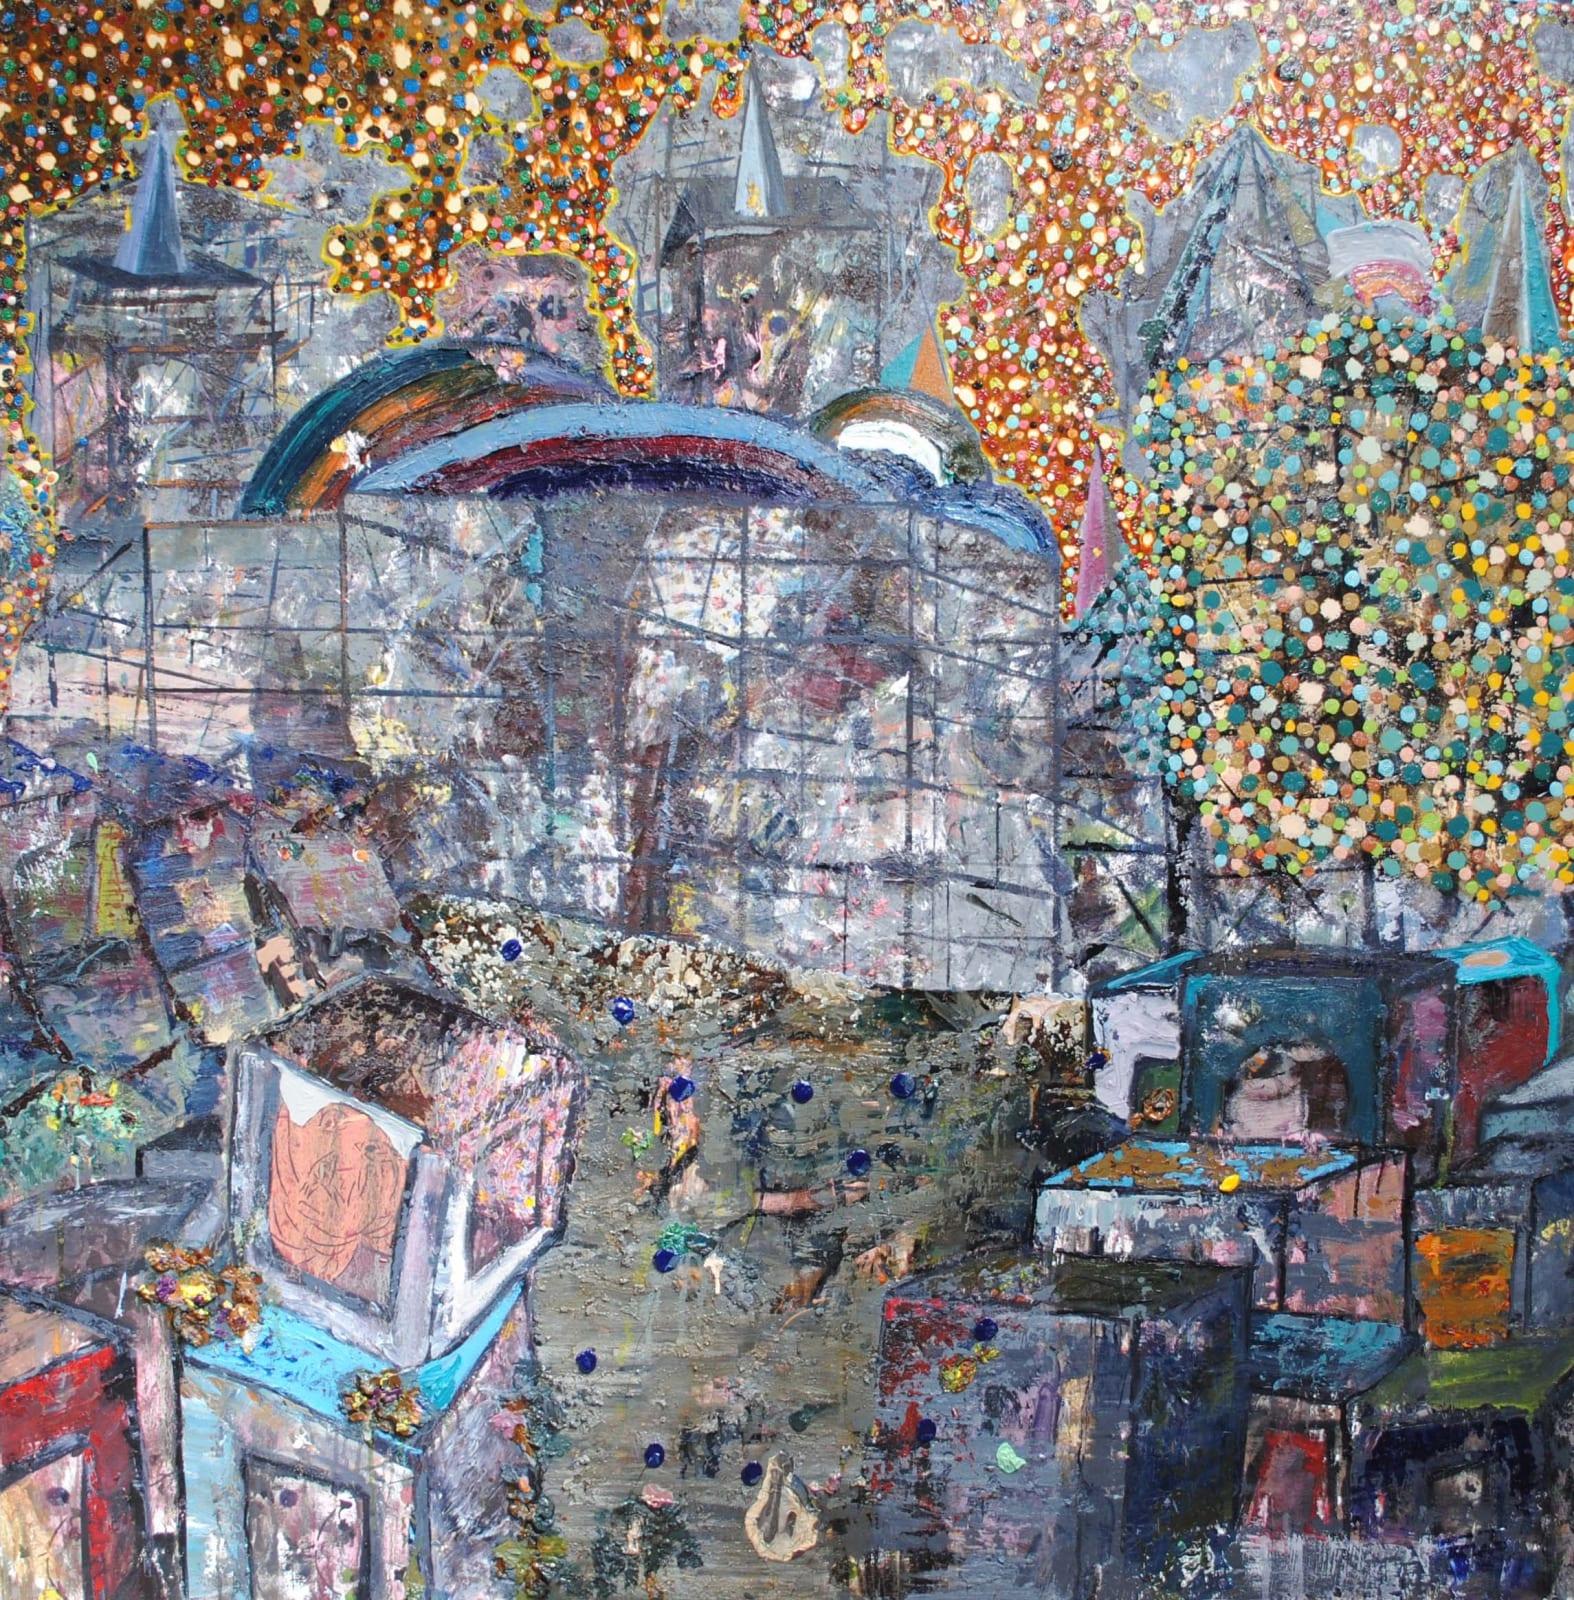 Thomas Brezing One man's toxic waste is another man's potpourri Oil on canvas 150 x 150cm